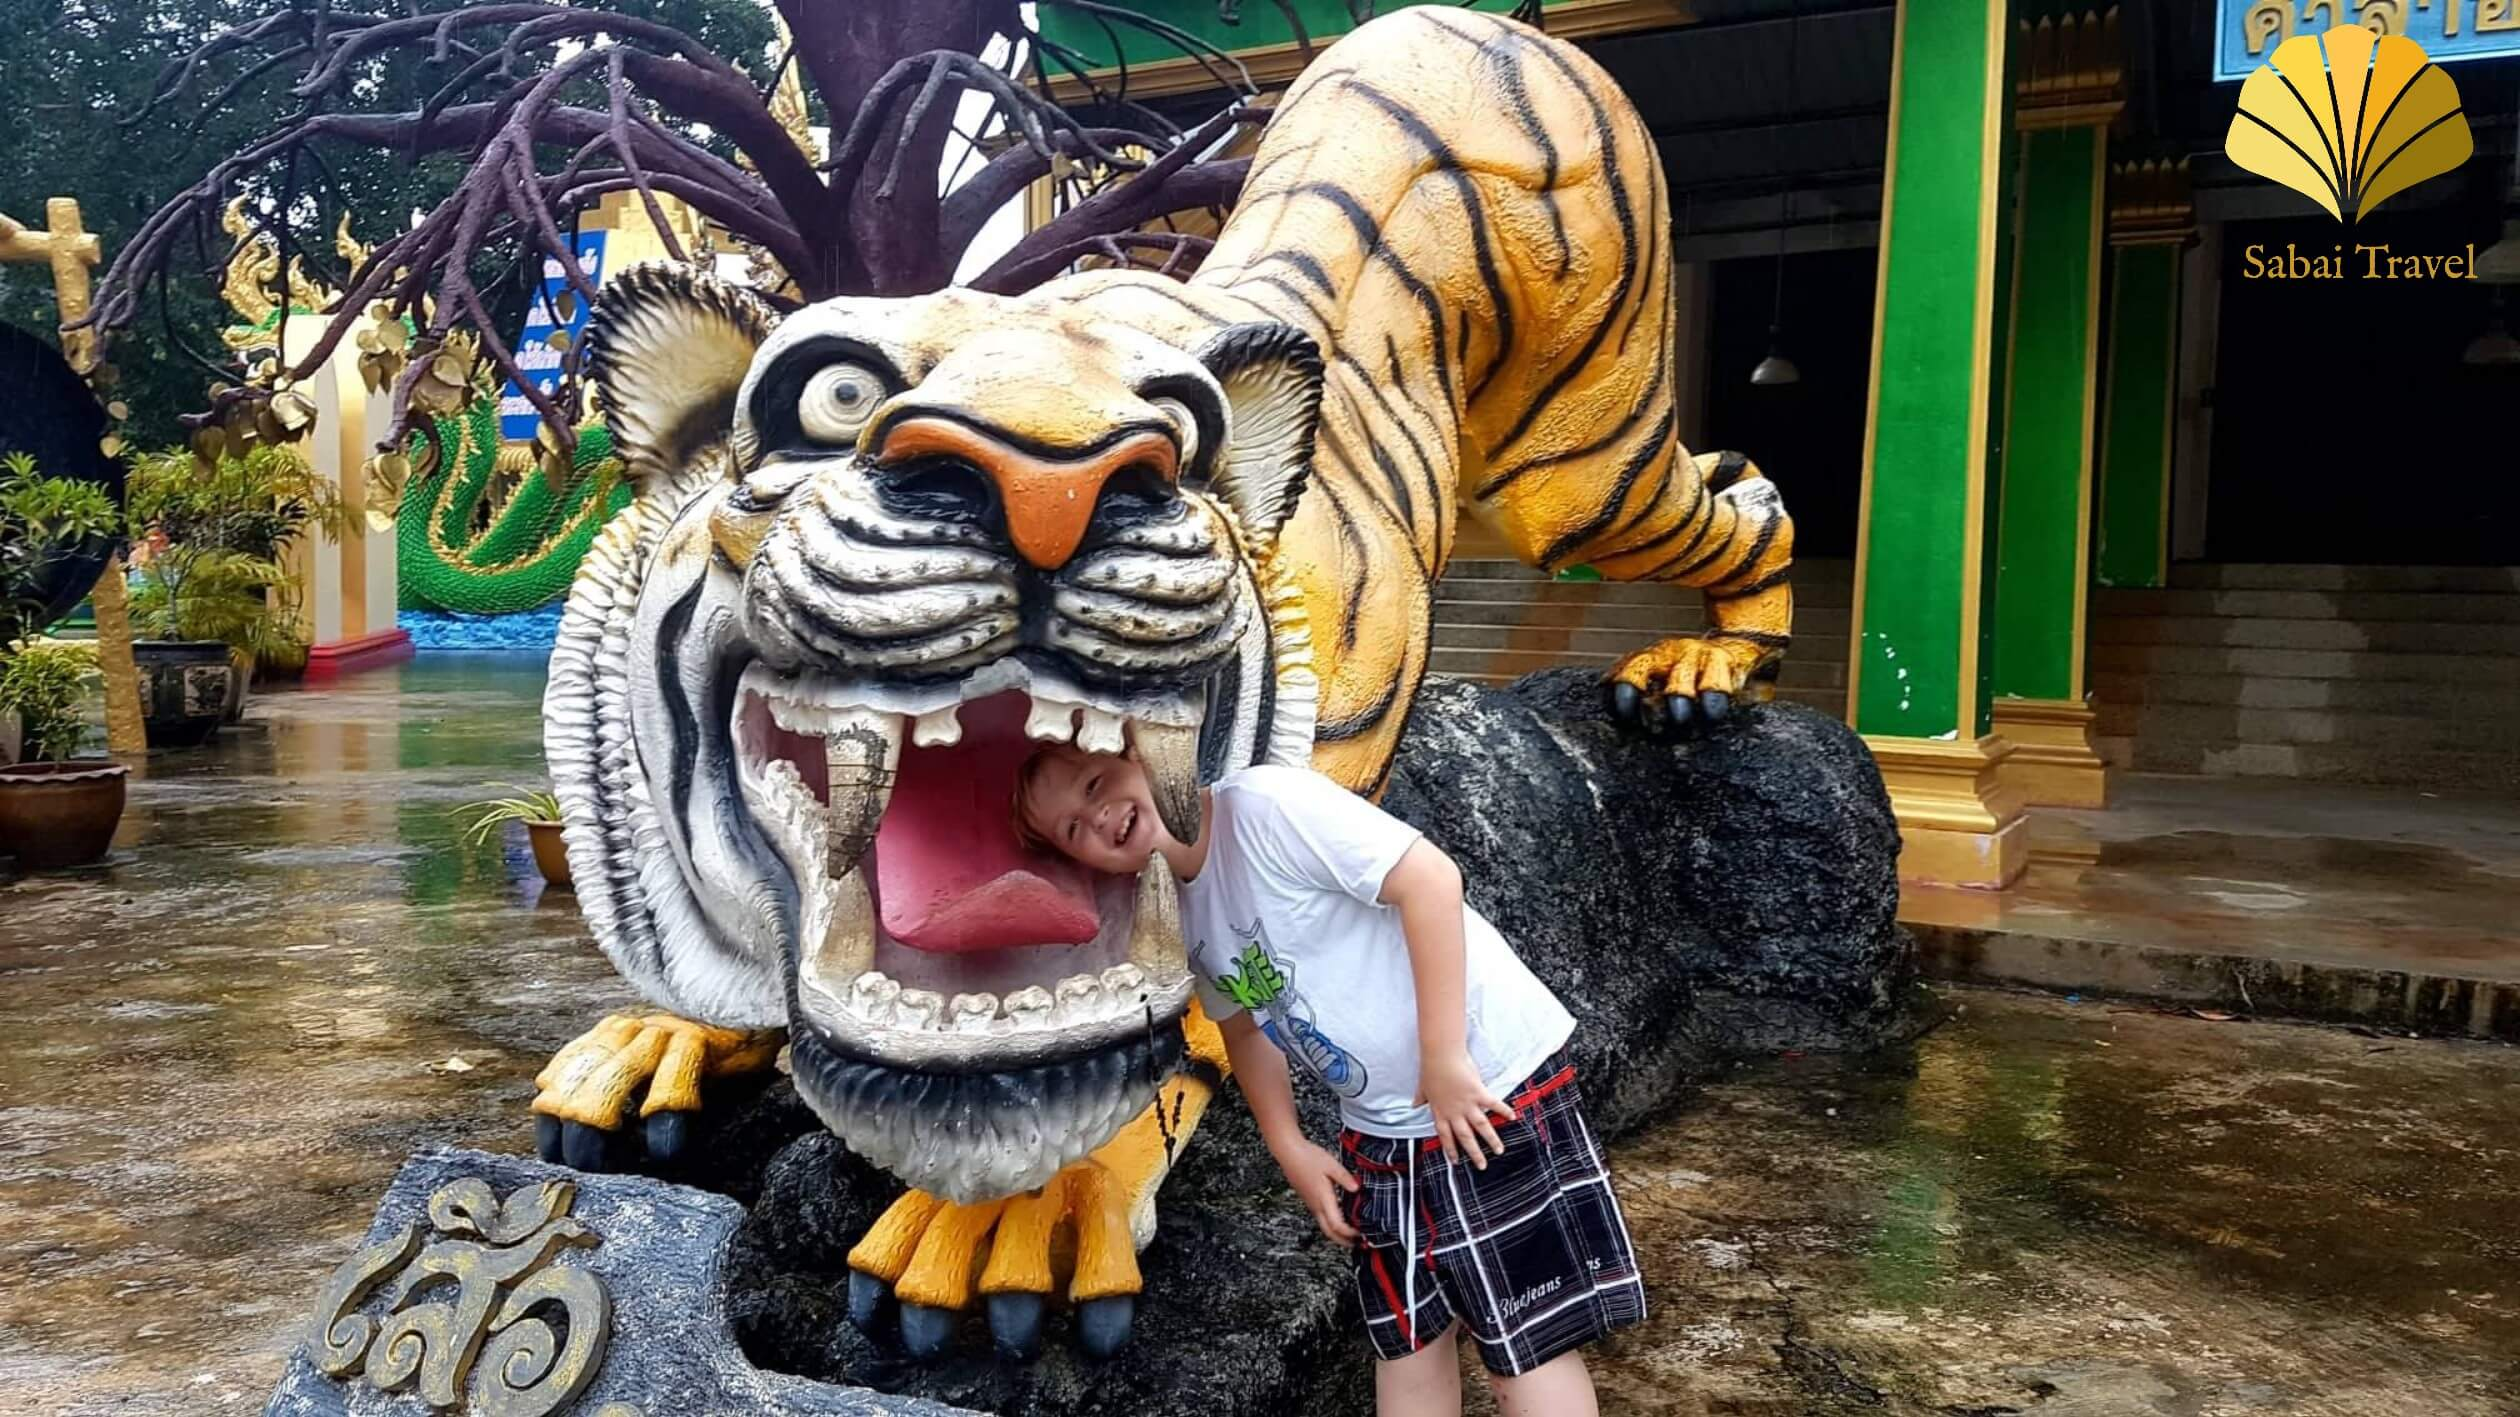 thailand, sabai26